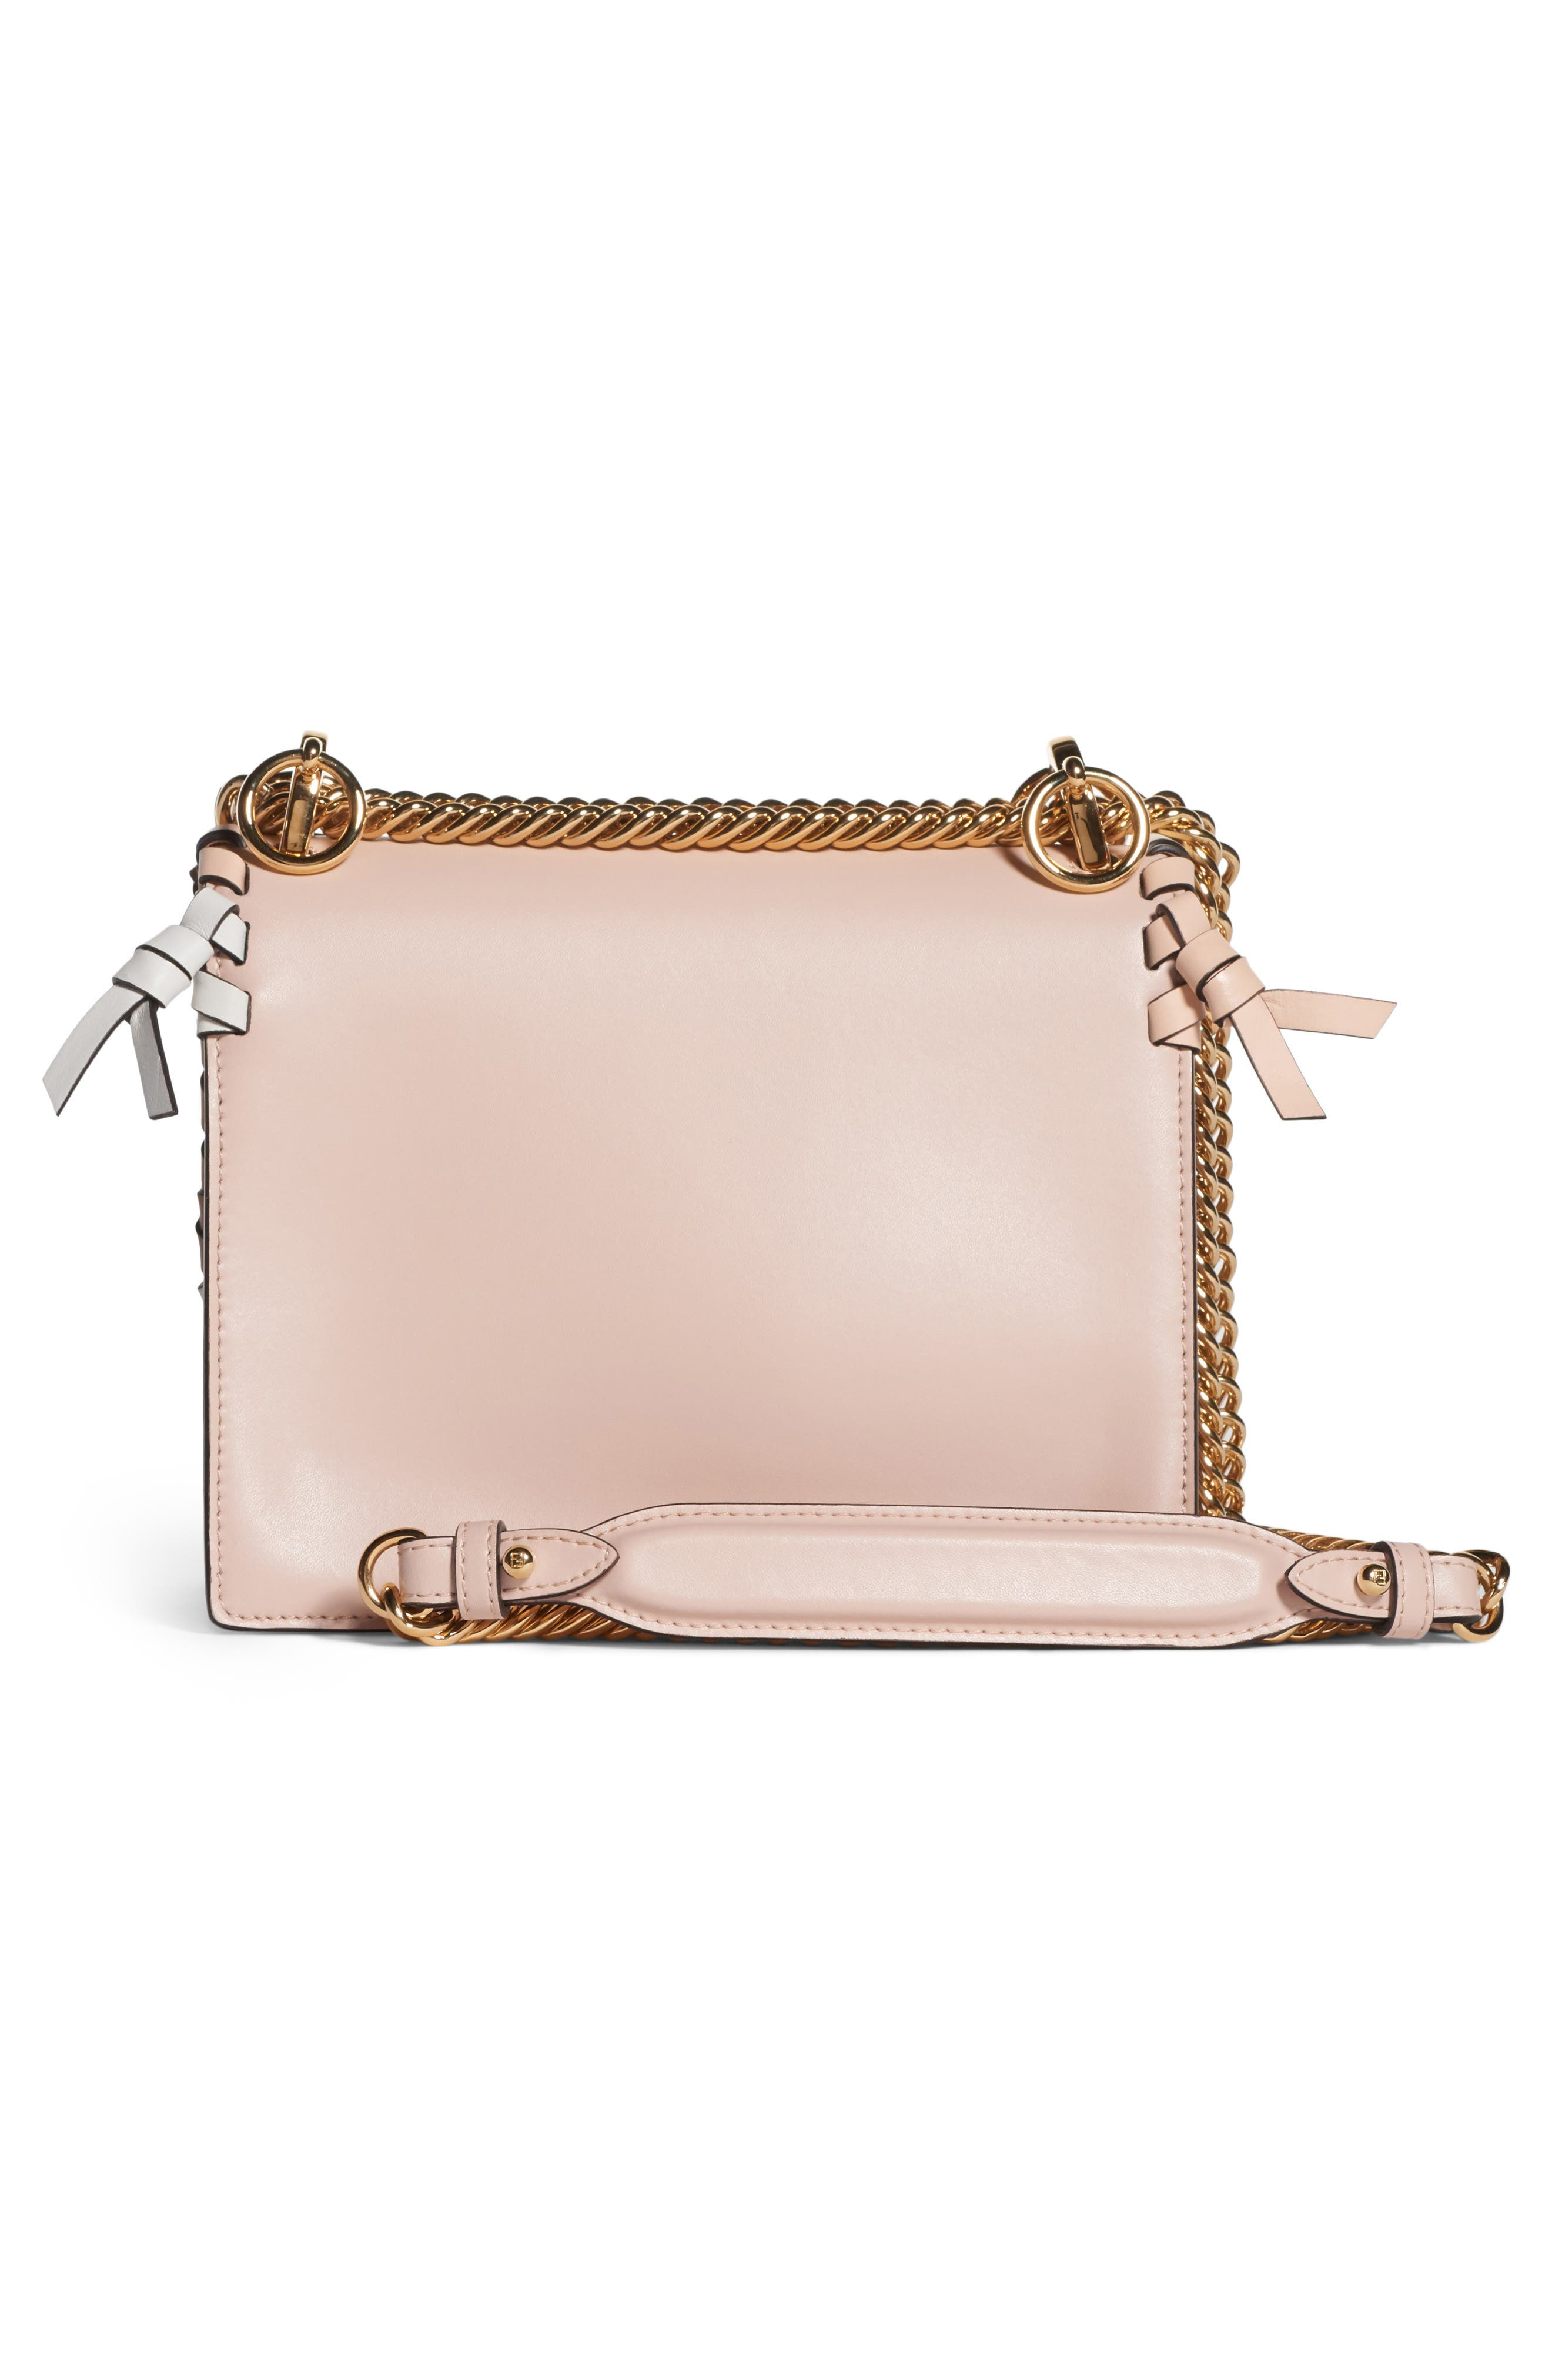 Small Kan Whipstitch Leather Shoulder Bag,                             Alternate thumbnail 2, color,                             PLASTER MULTI